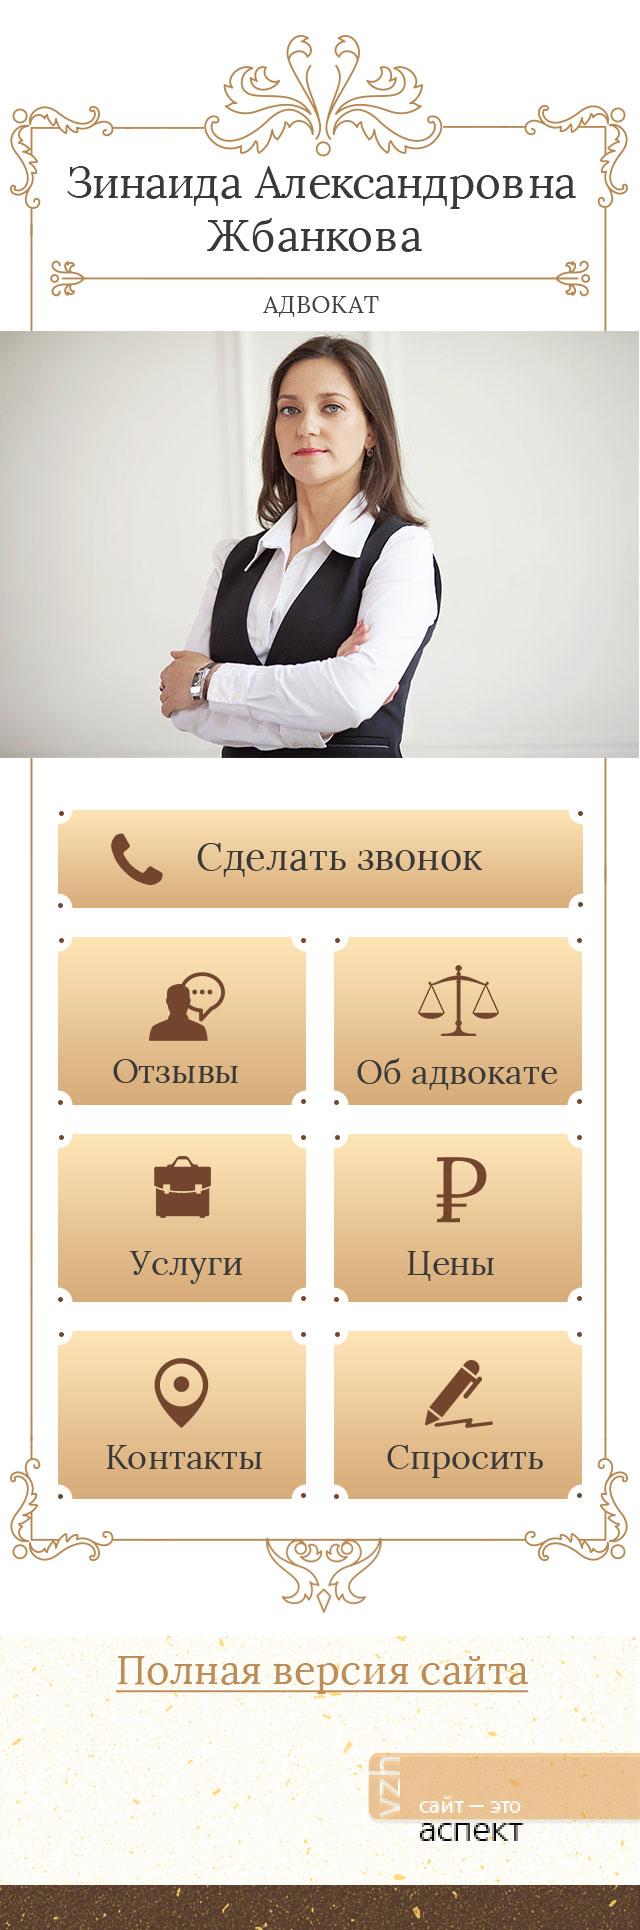 b2b сайты примеры Адвокат Жбанкова 320 px